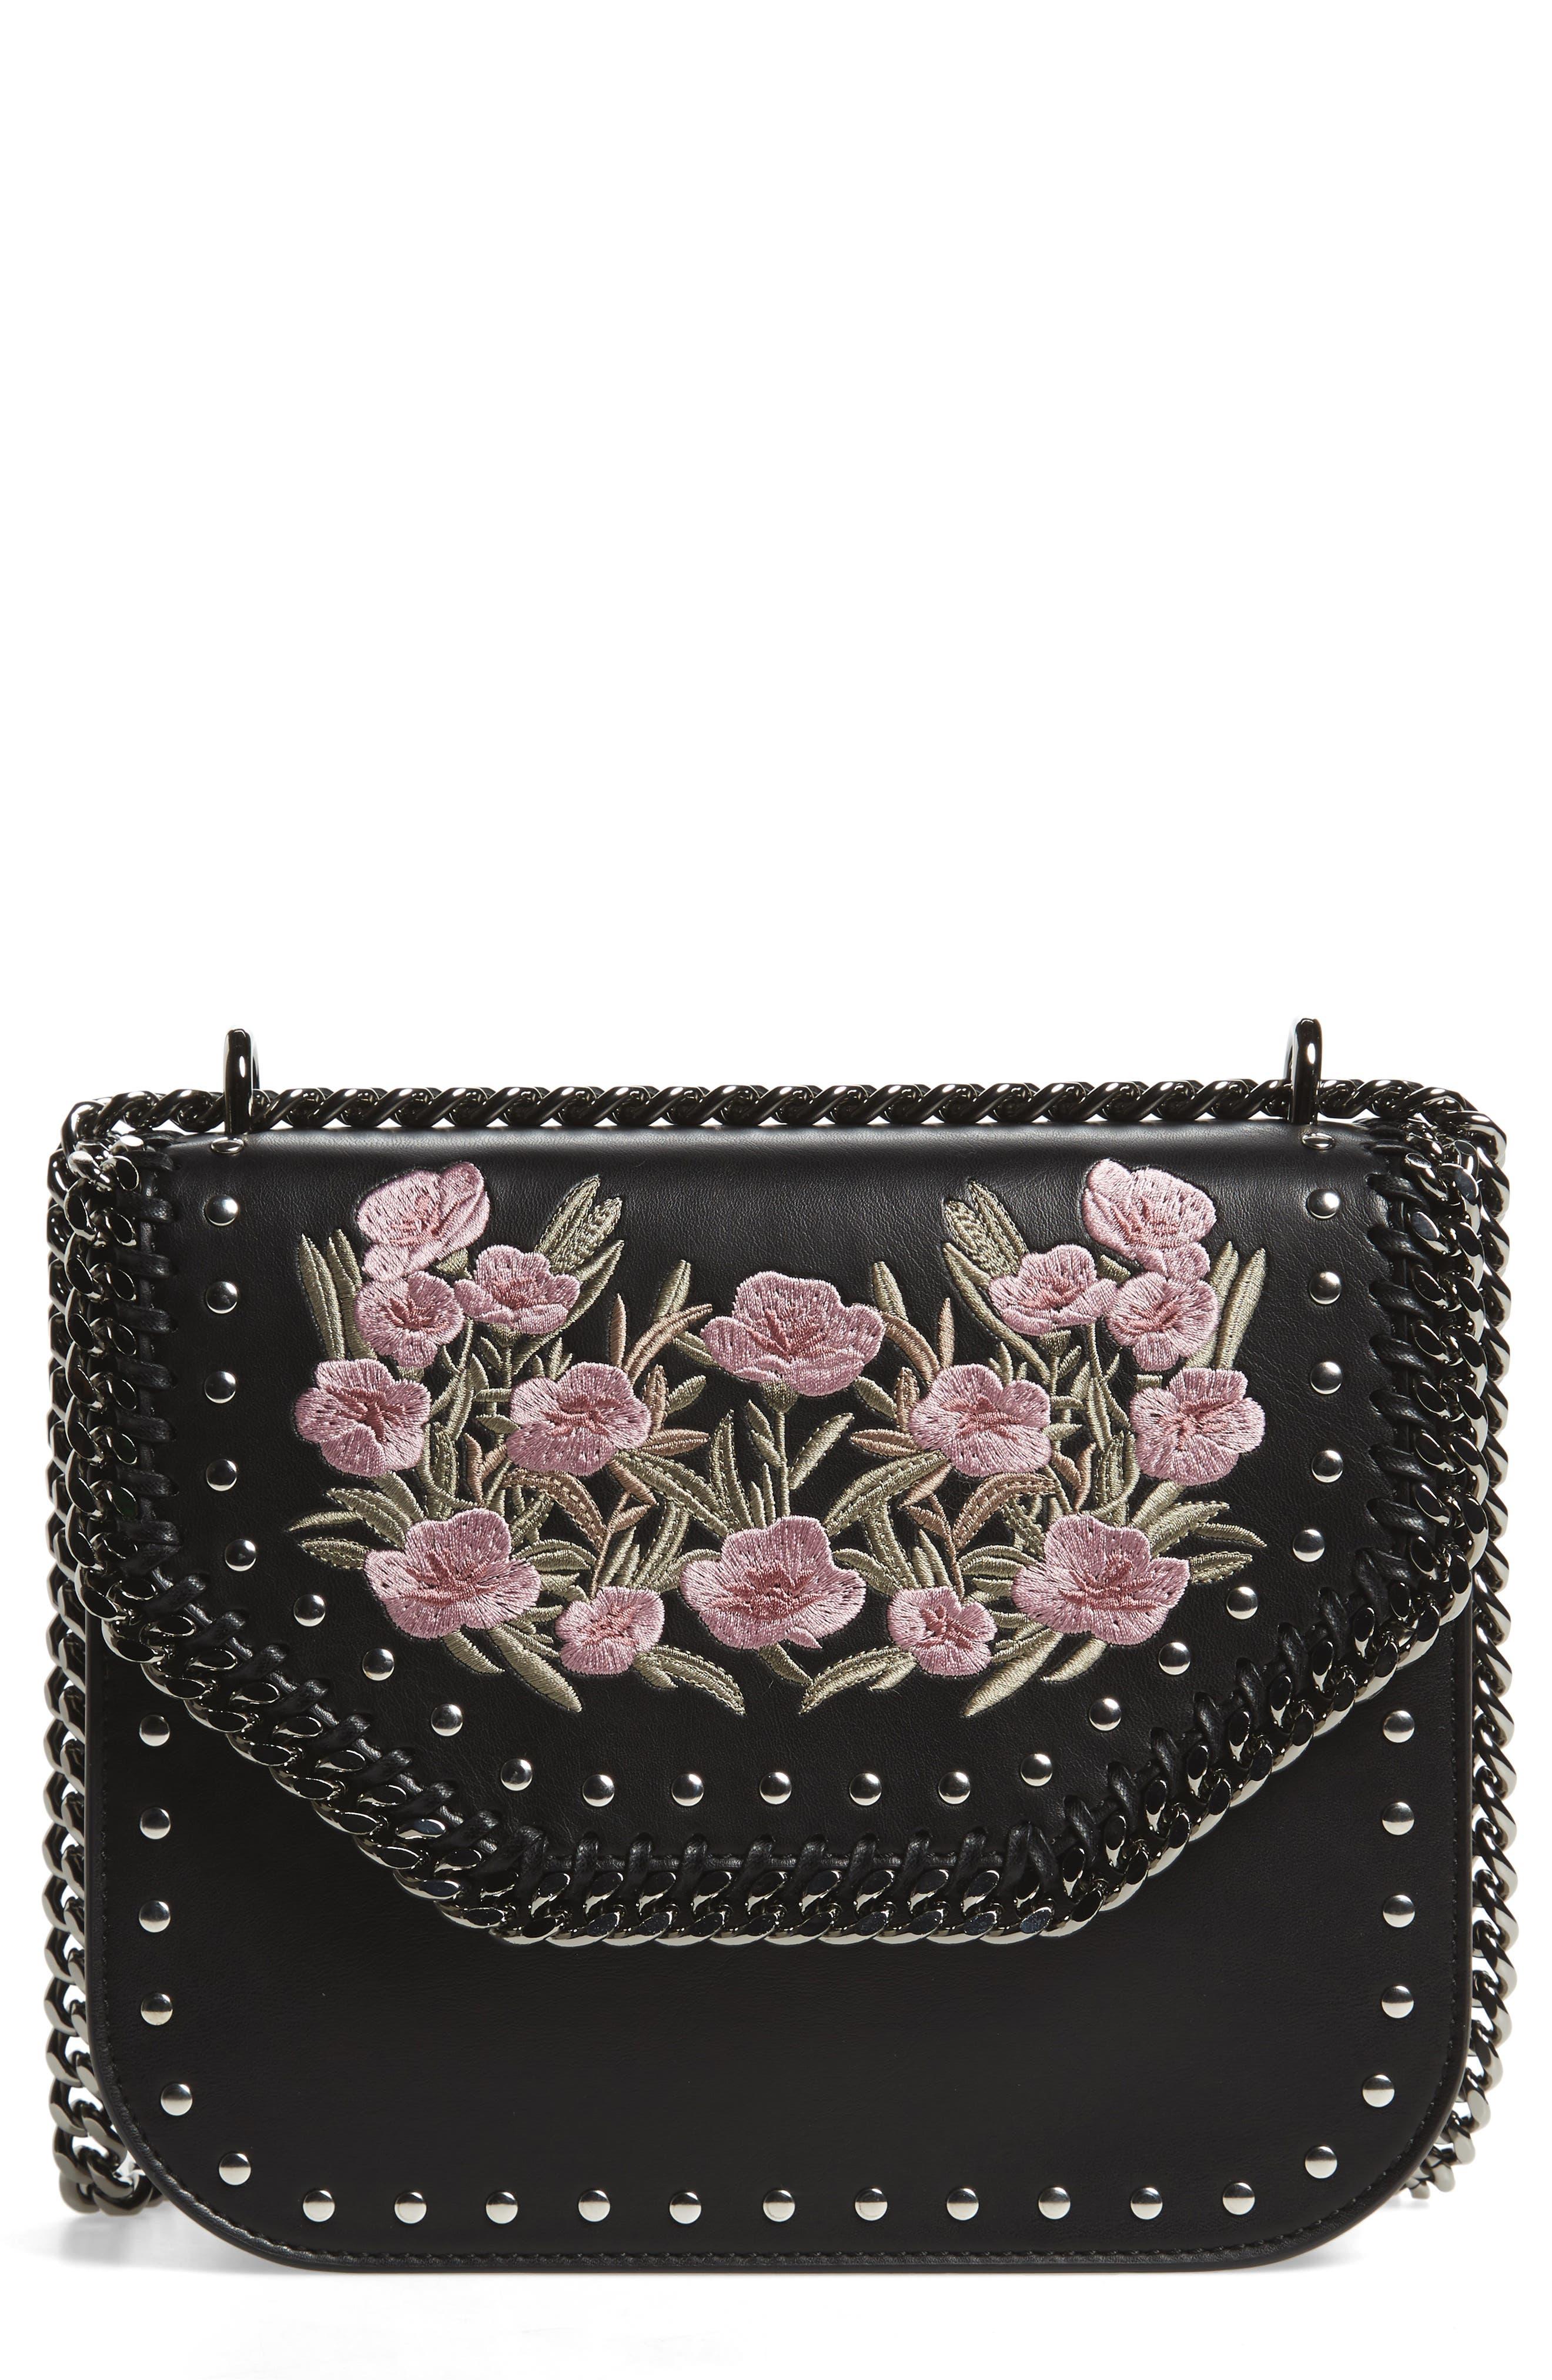 Stella McCartney Medium Falabella Box Floral Shoulder Bag